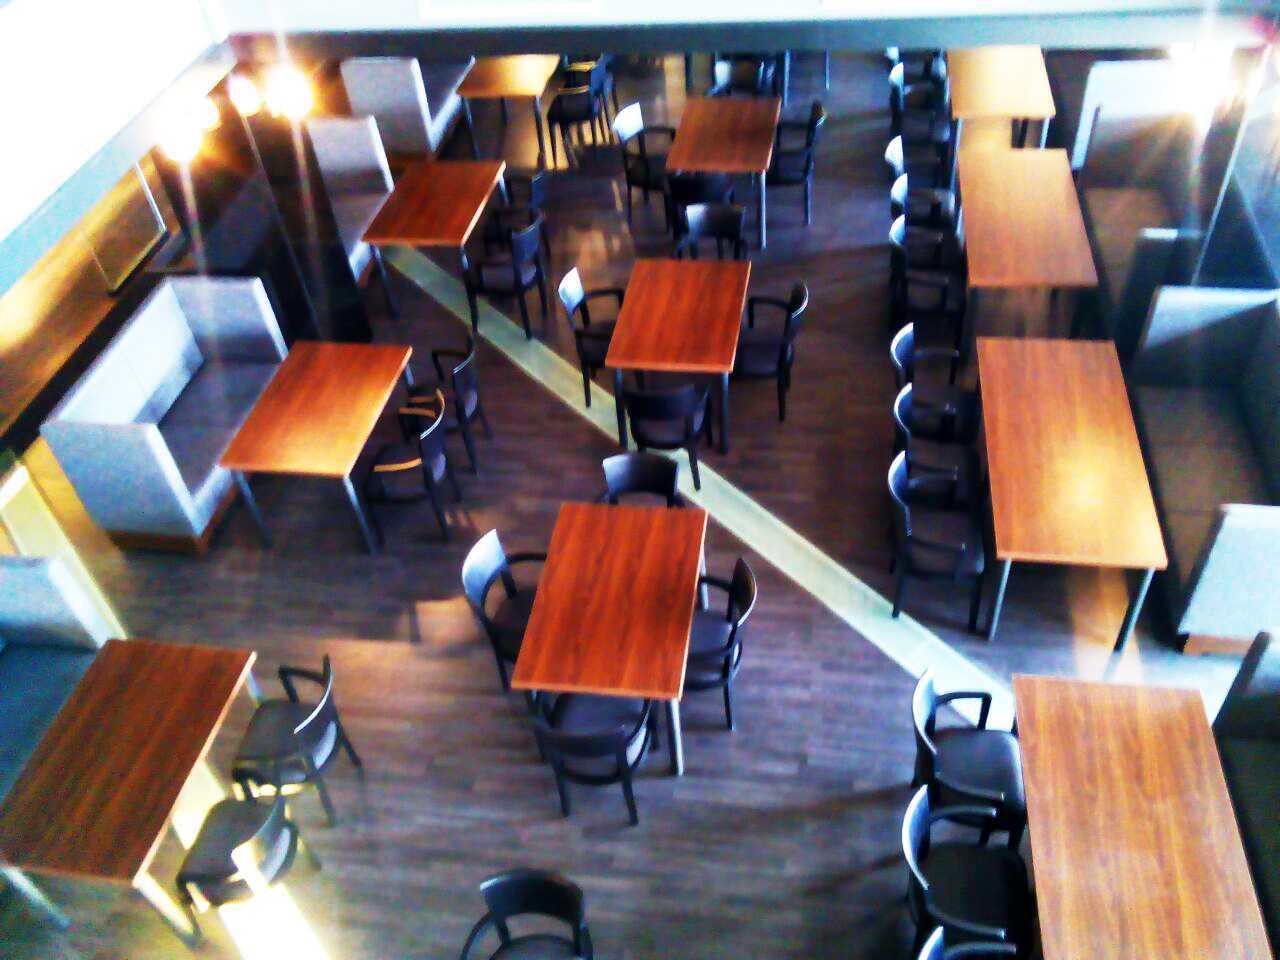 Tingkat By Digindo Western Restaurant Horison Forbis Hotel Jl. Lingkar Selatan Km.2, Waringinkurung, Serang, Banten 42161, Indonesia Jl. Lingkar Selatan Km.2, Waringinkurung, Serang, Banten 42161, Indonesia Seating Area Interior View   43474